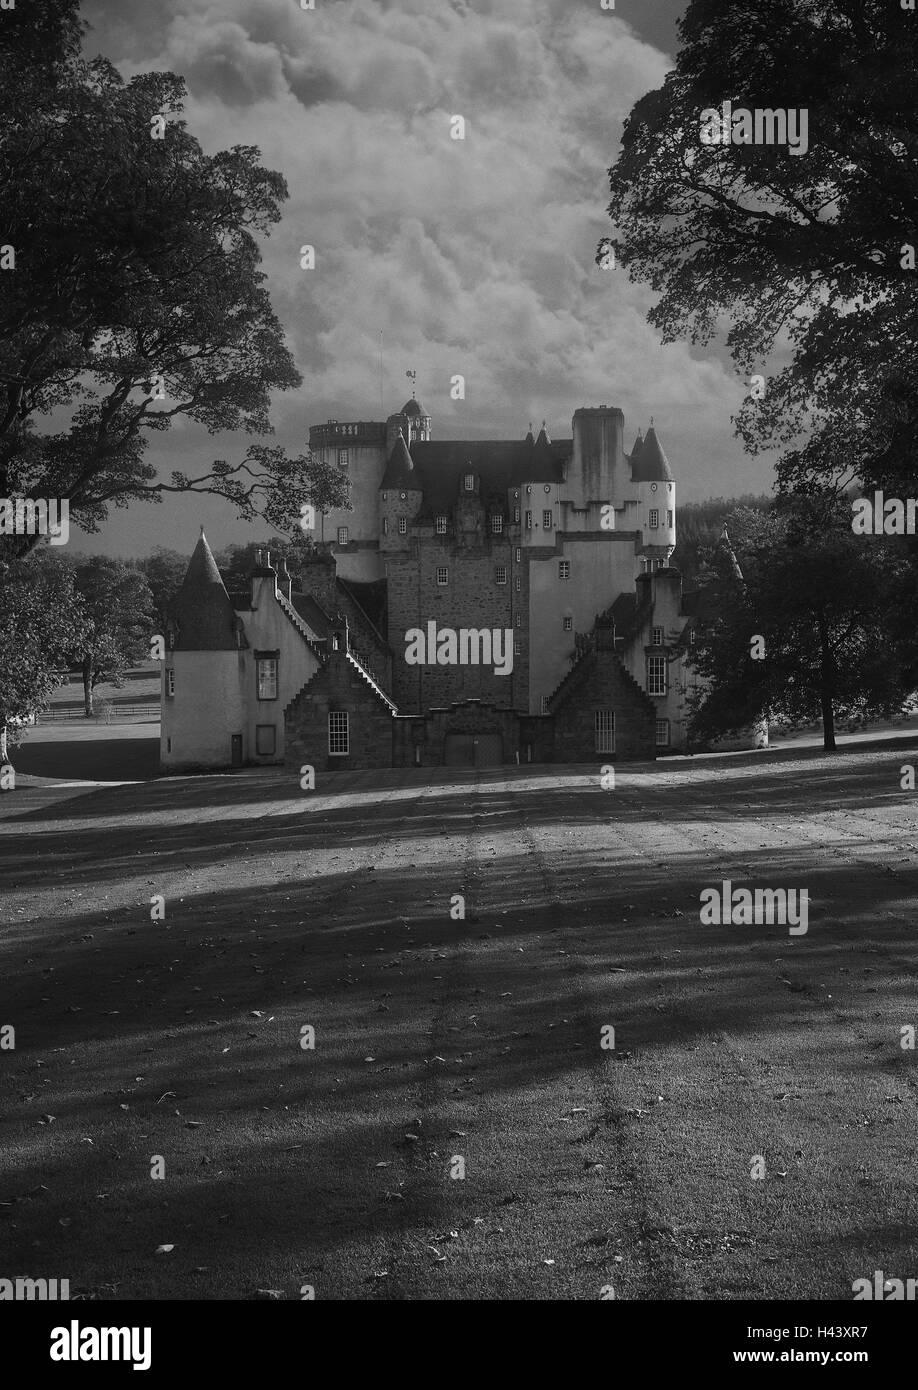 Great Britain, Scotland, Grampian, Fraser Castle, cloud sky, sombre, gray, s/w, [M], - Stock Image